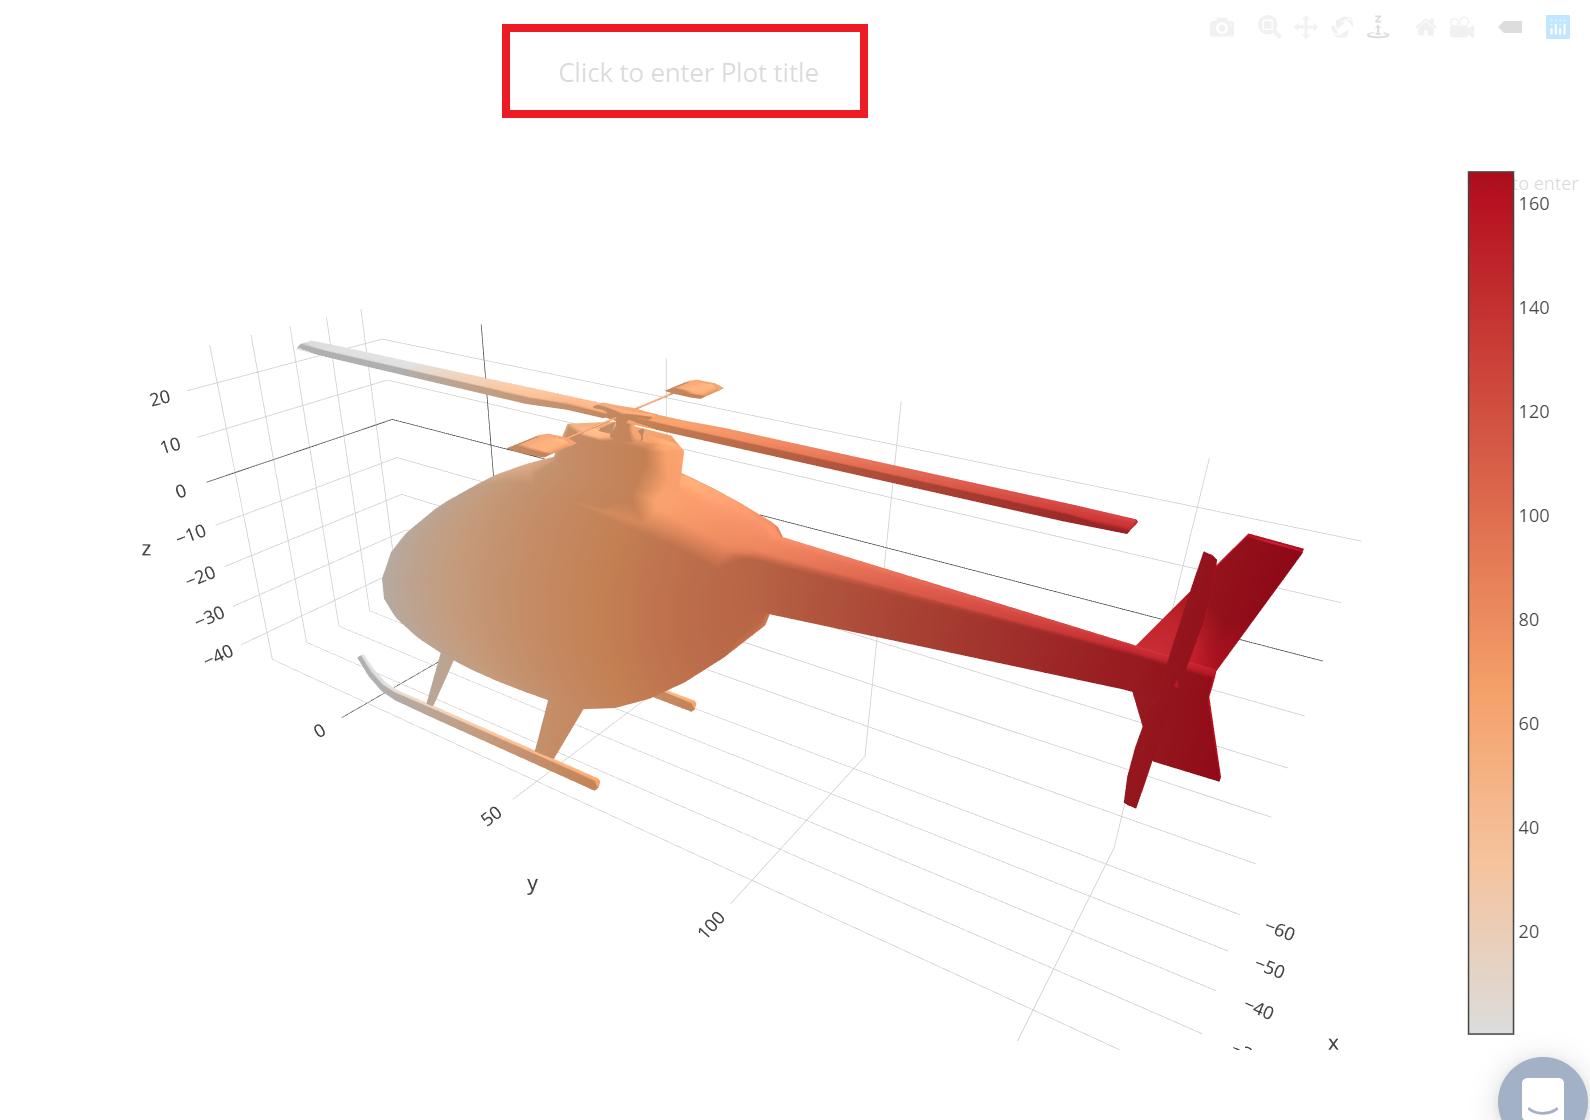 3D Mesh Plot